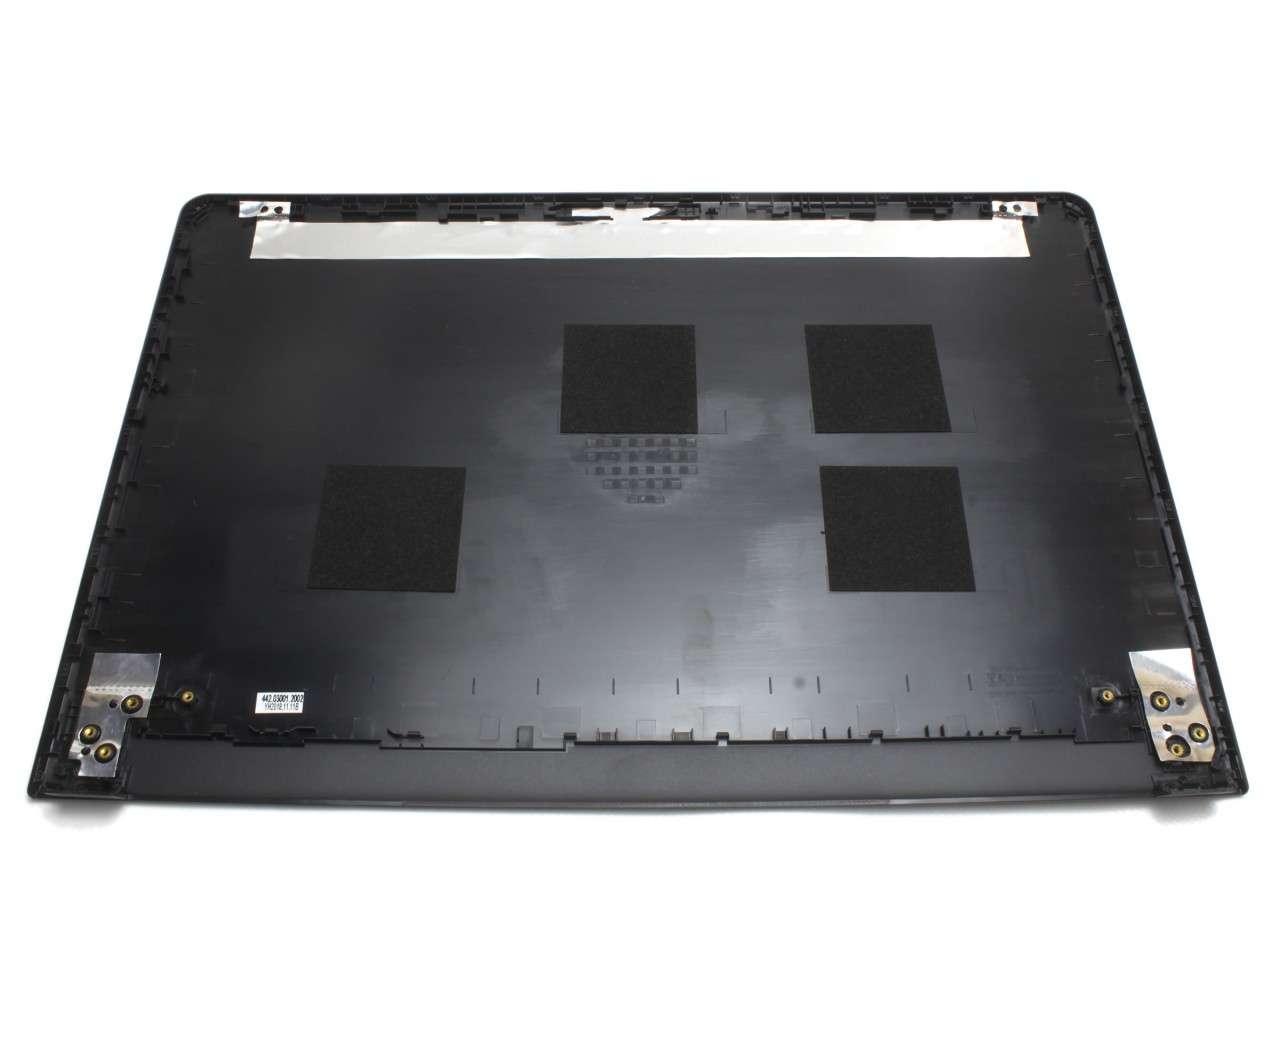 Capac Display BackCover Dell Inspiron 15 3565 Carcasa Display pentru laptop cu touchscreen imagine powerlaptop.ro 2021